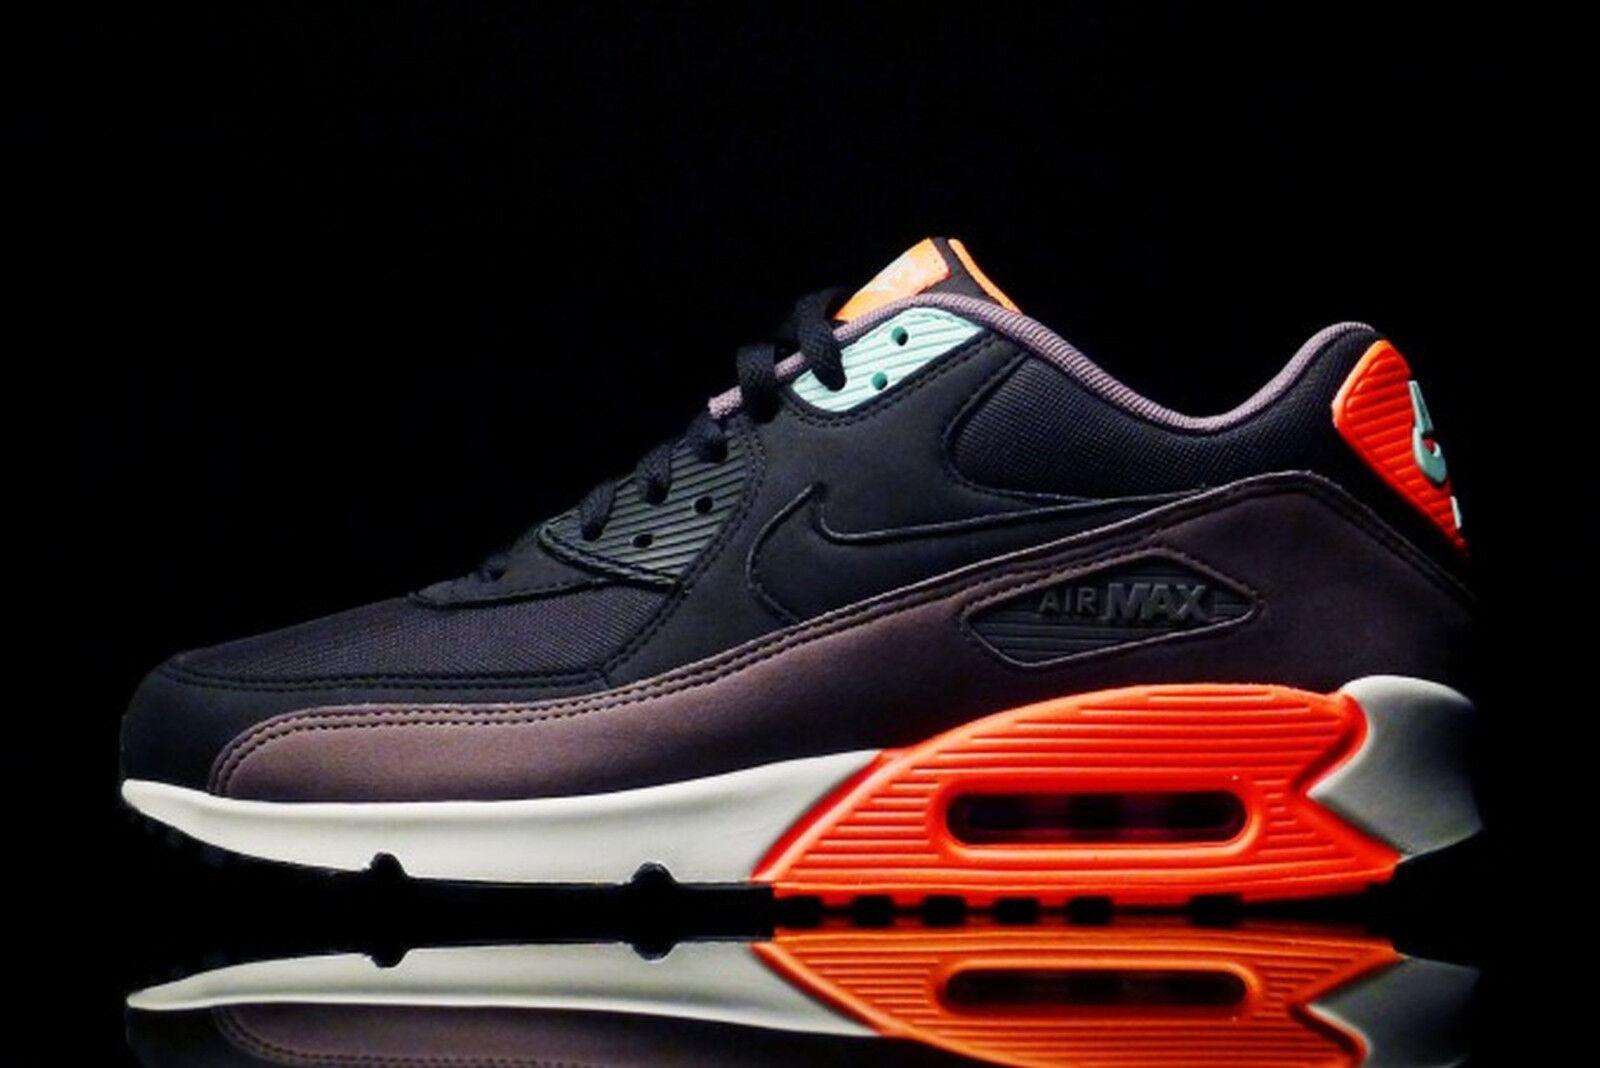 Nike Air Max 90 Essential shoe size 9.5 537384-036 Mens Black Hyper Crimson